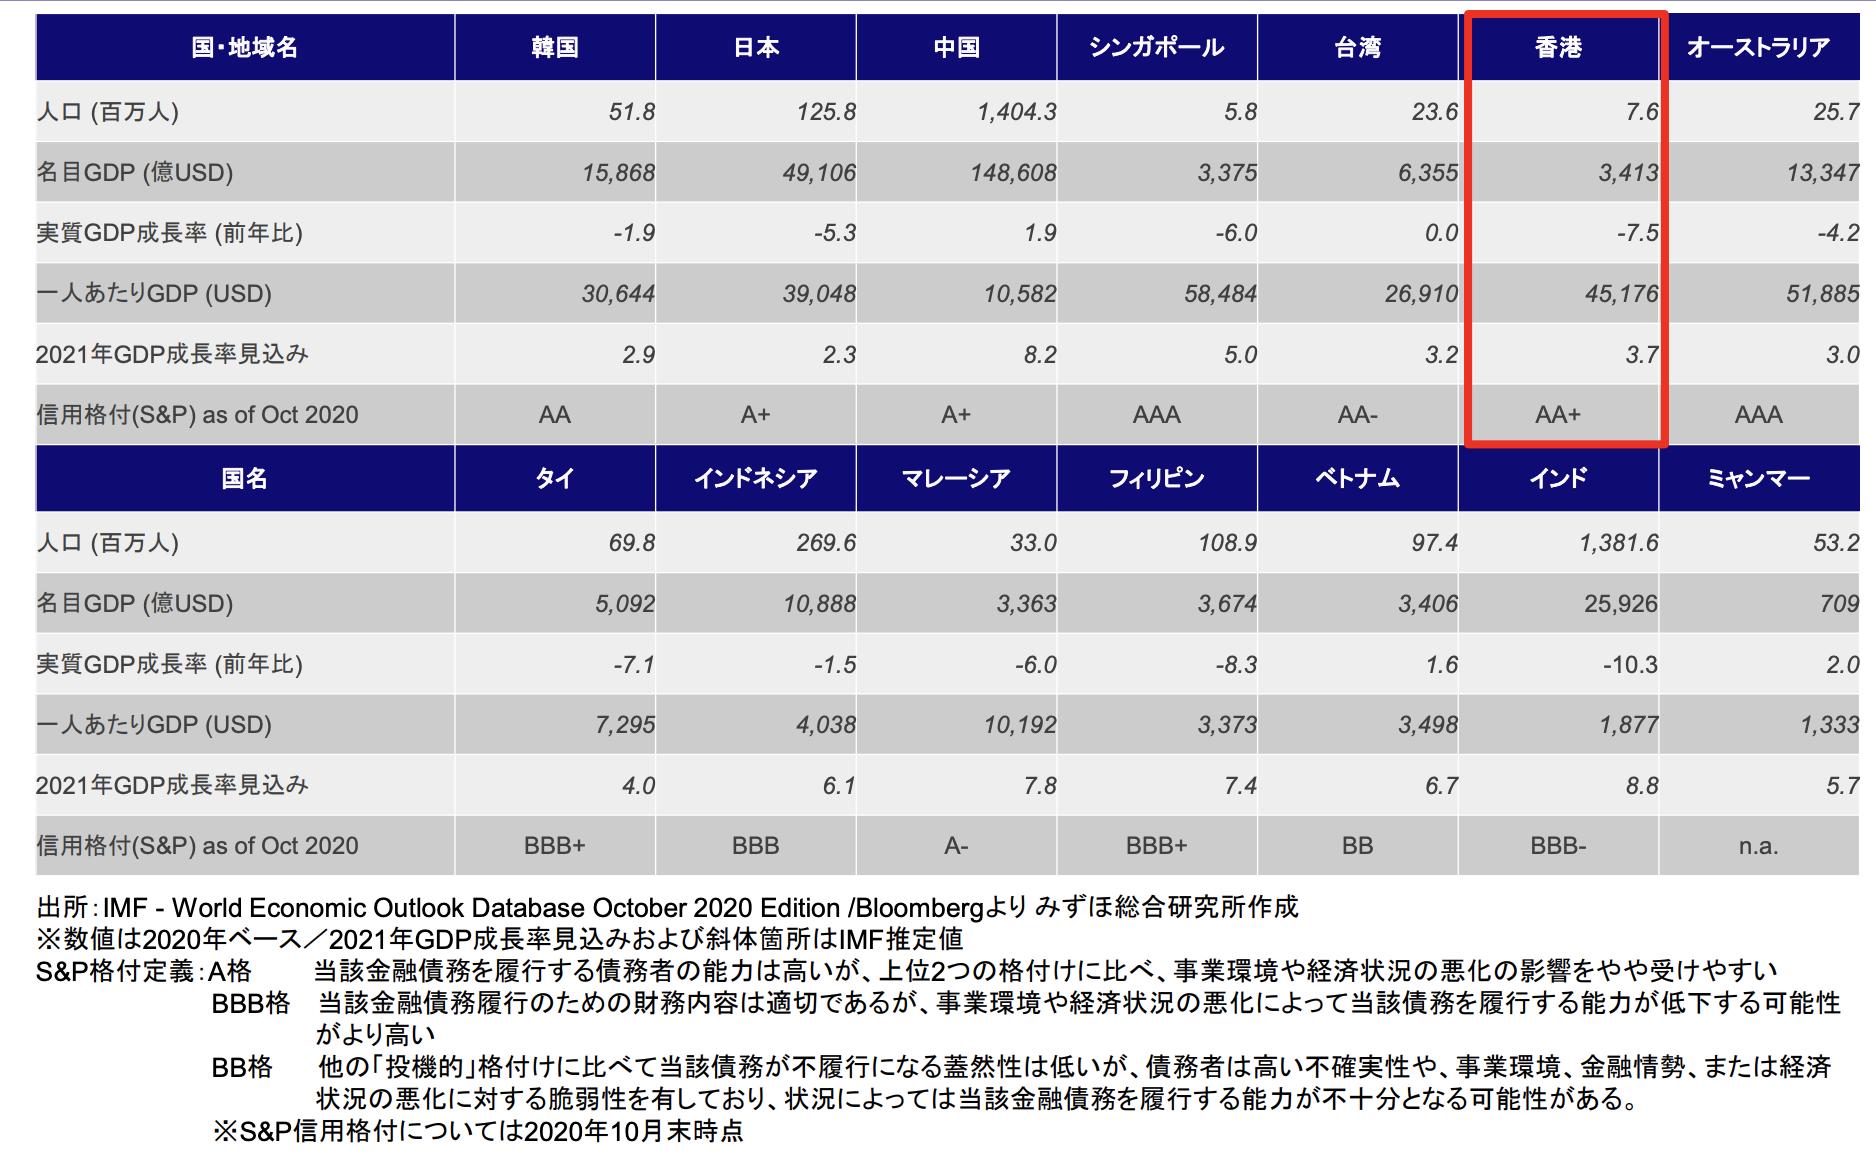 アジア主要国・地域経済指標